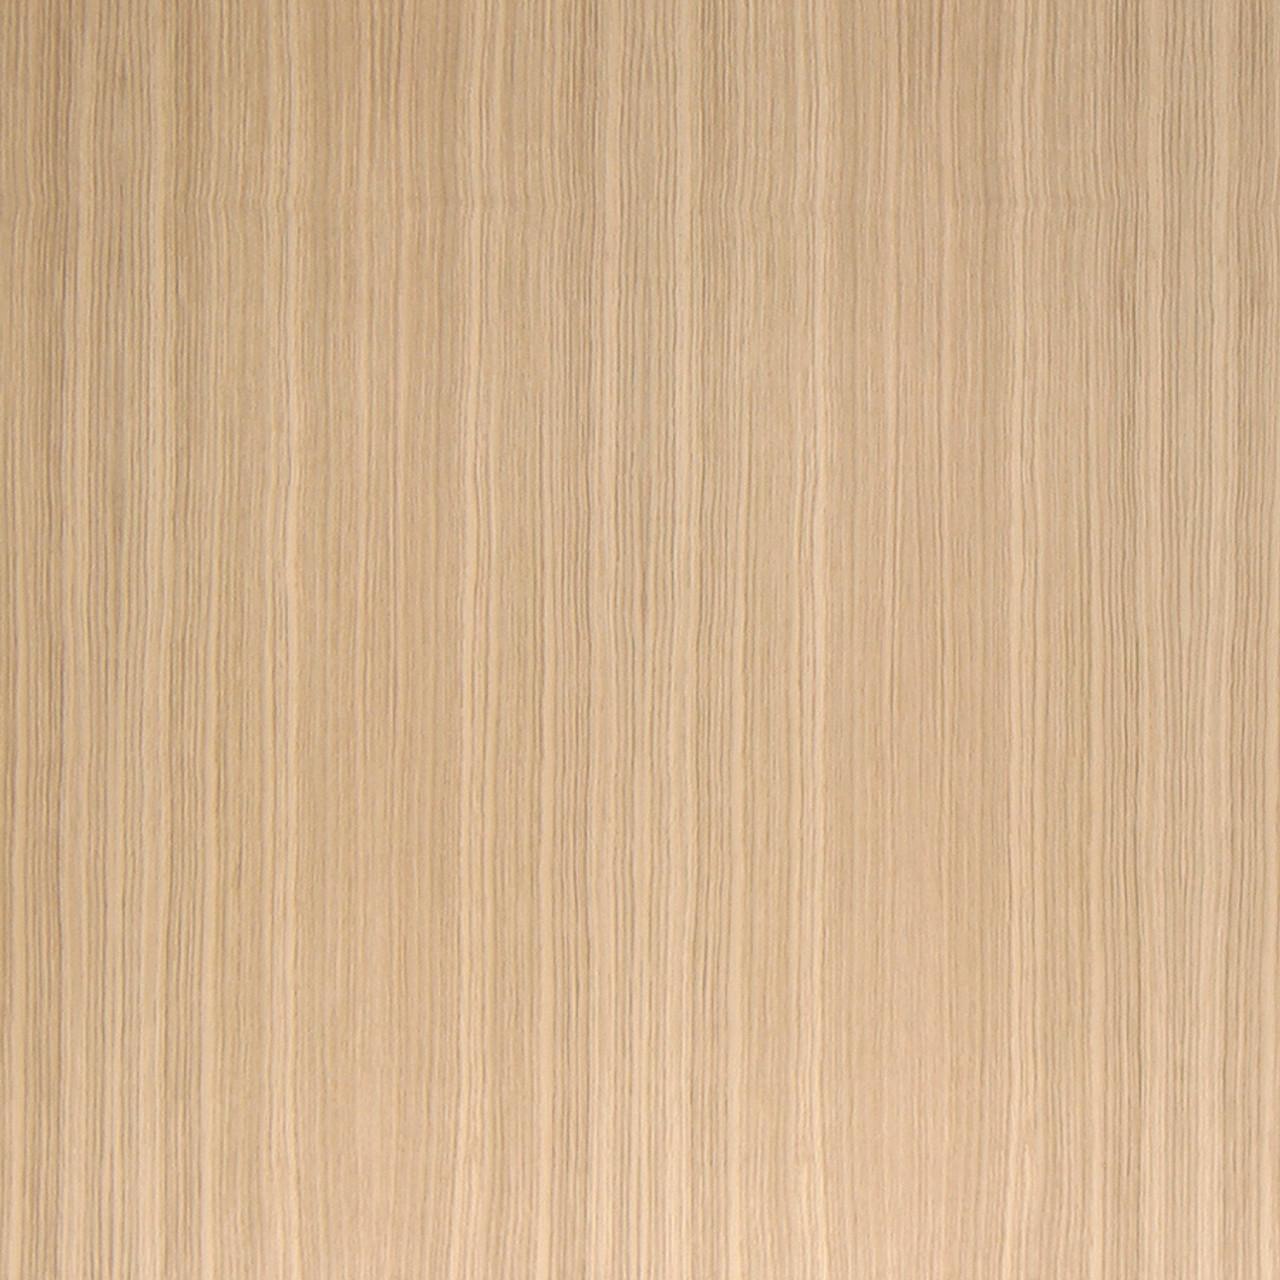 White Oak Veneer Rift Oak White Wood Veneers Sheets Oakwood Veneer Company